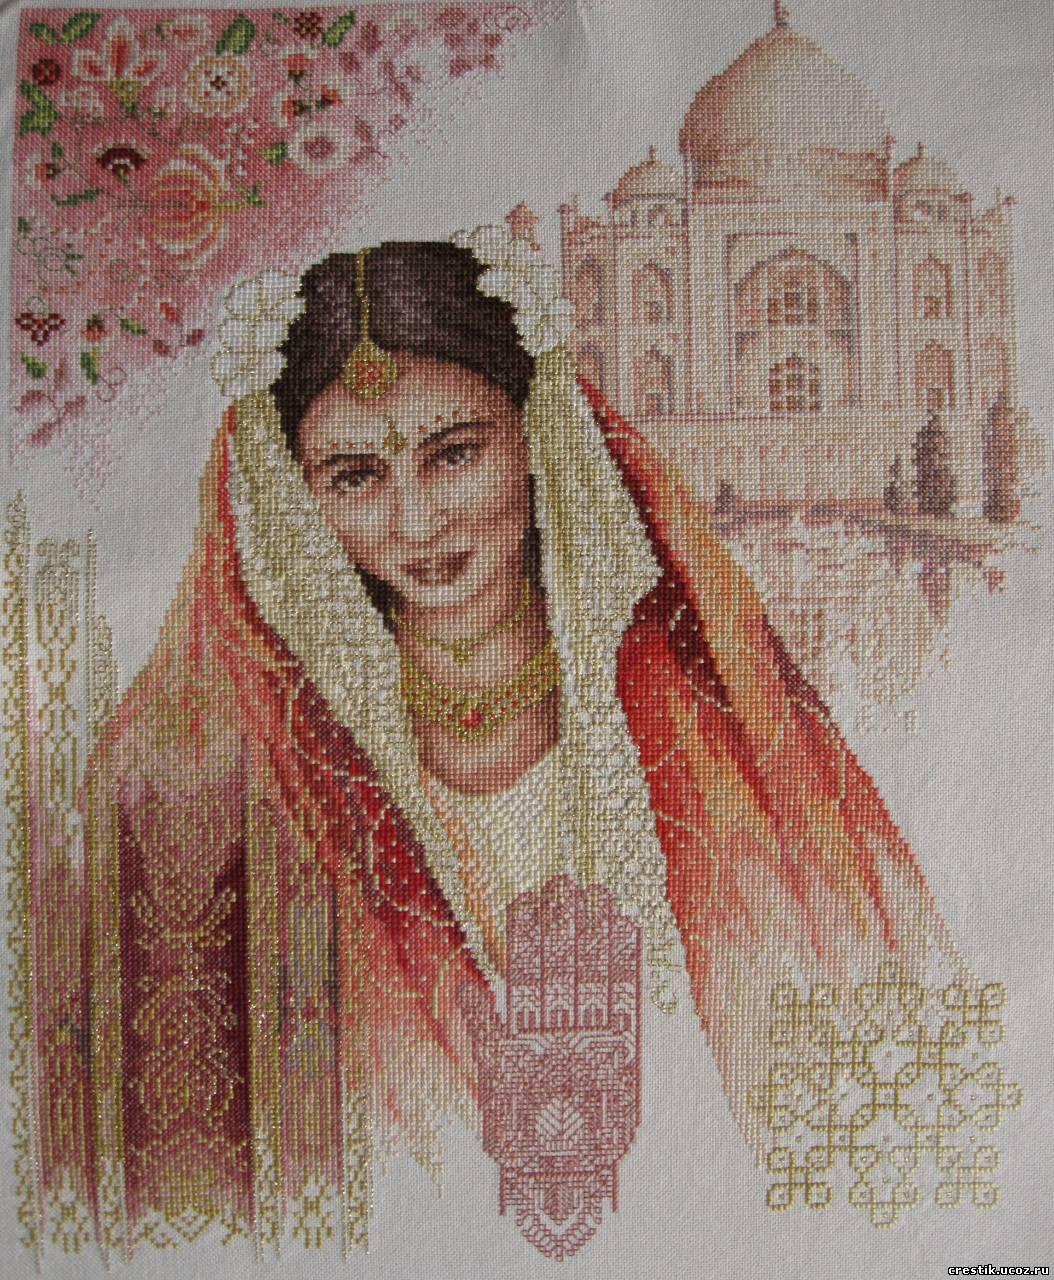 Вышивка Индианка на фоне Тадж-Махала